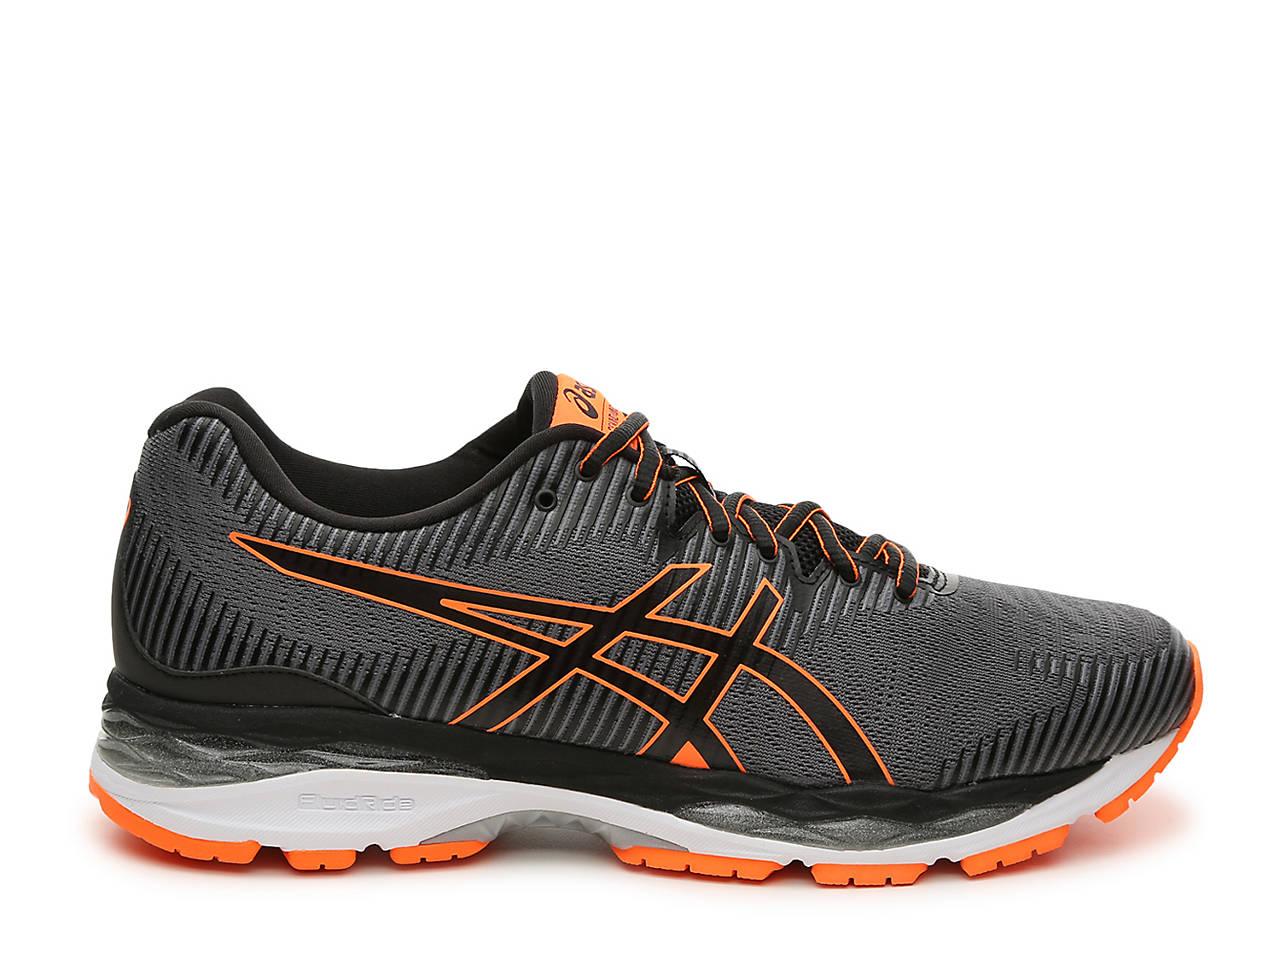 cc928b11a07 ASICS GEL-Ziruss 2 Running Shoe - Men's Men's Shoes | DSW